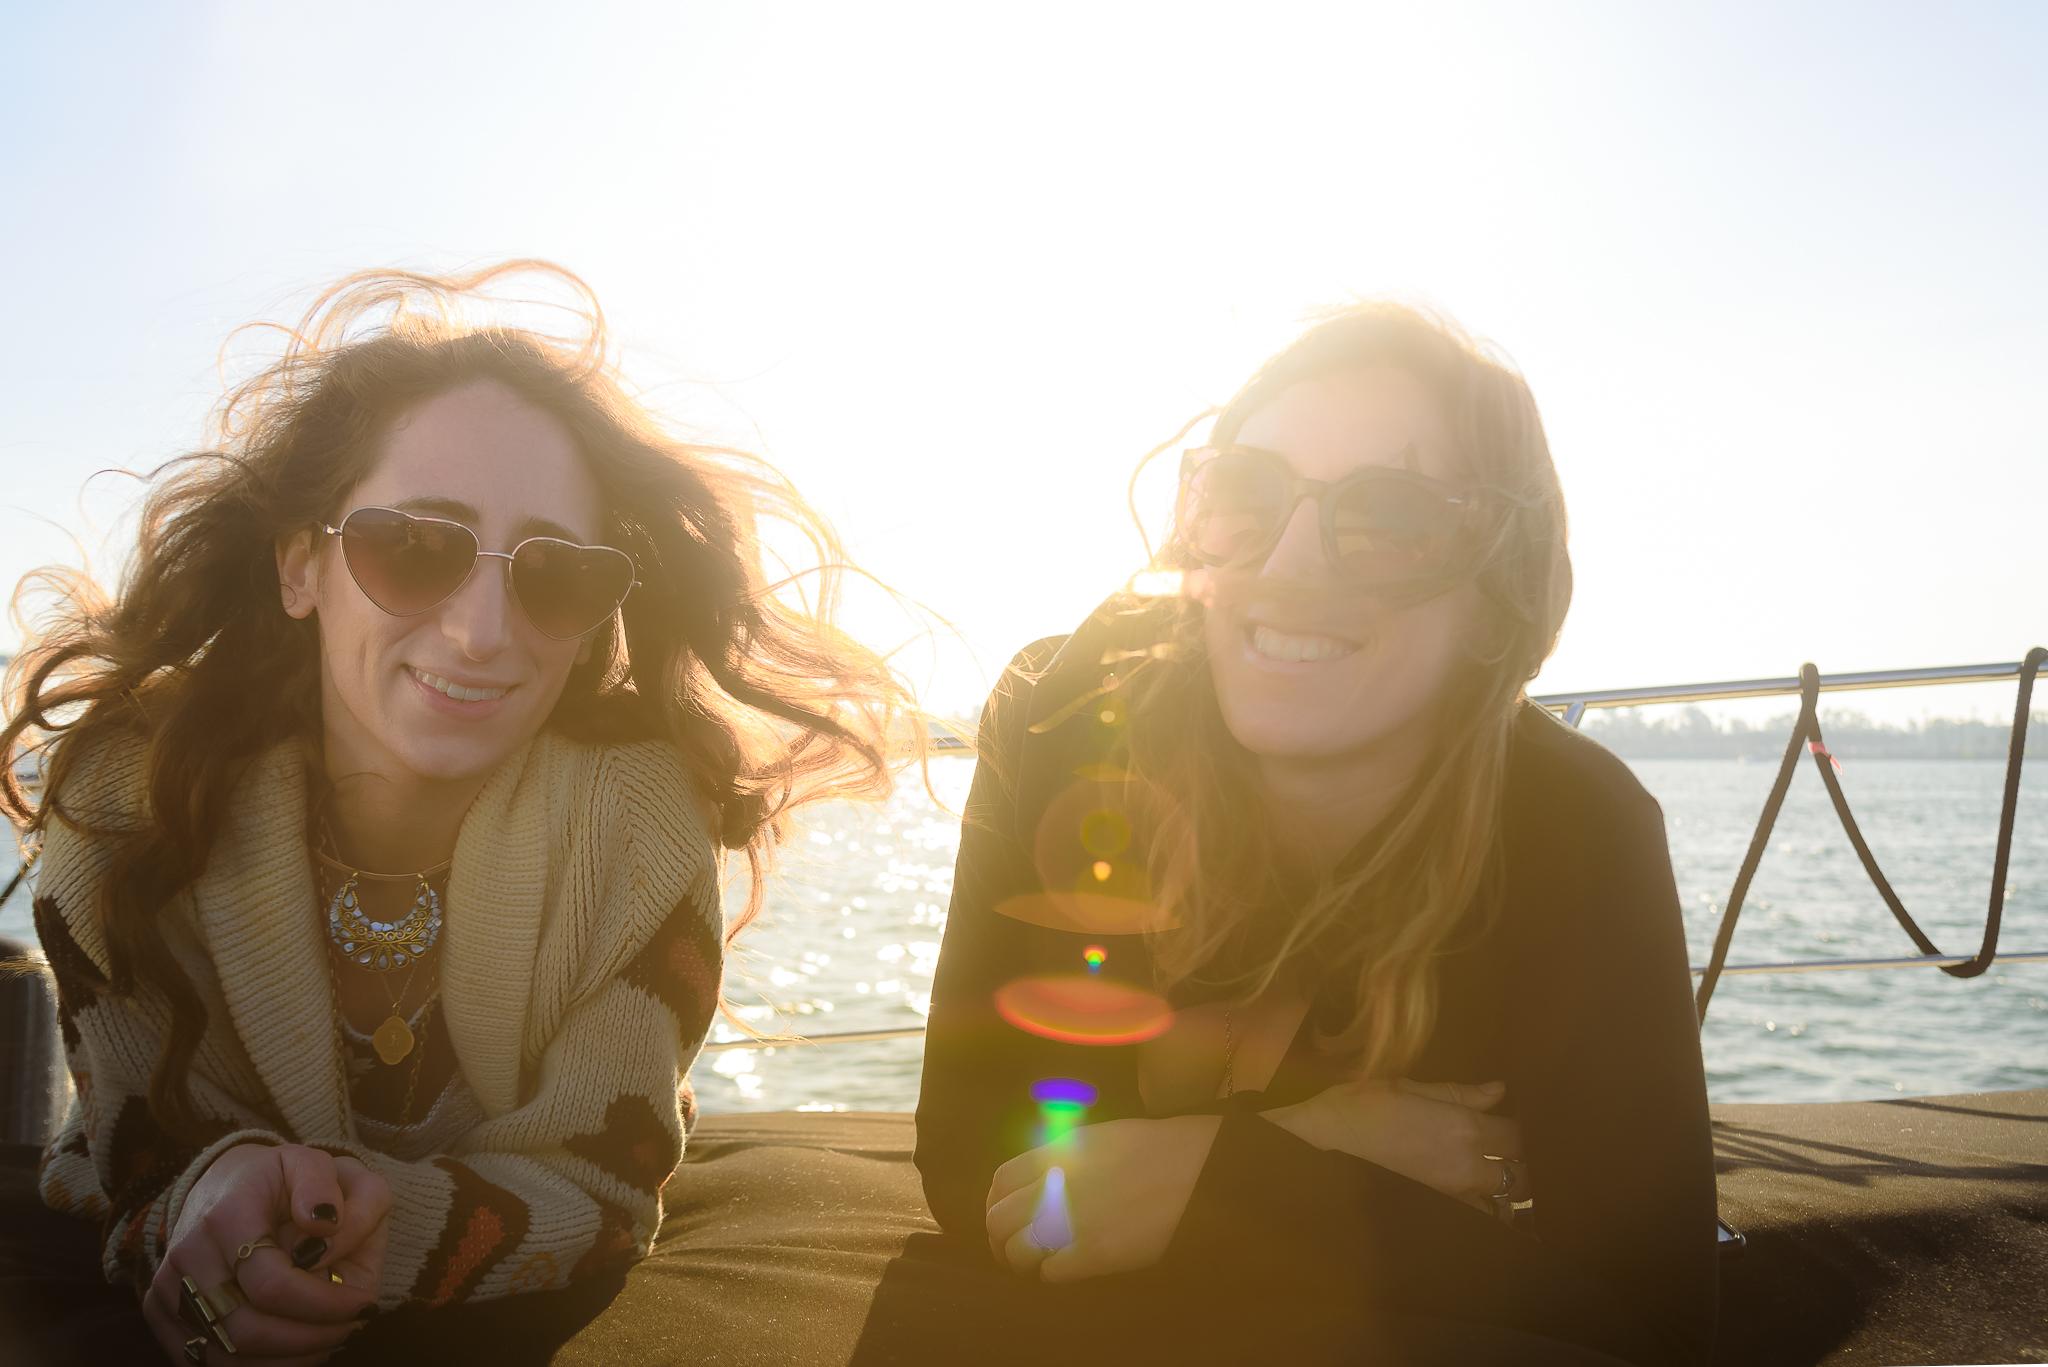 Sunshine and smiles. San Diego, CA